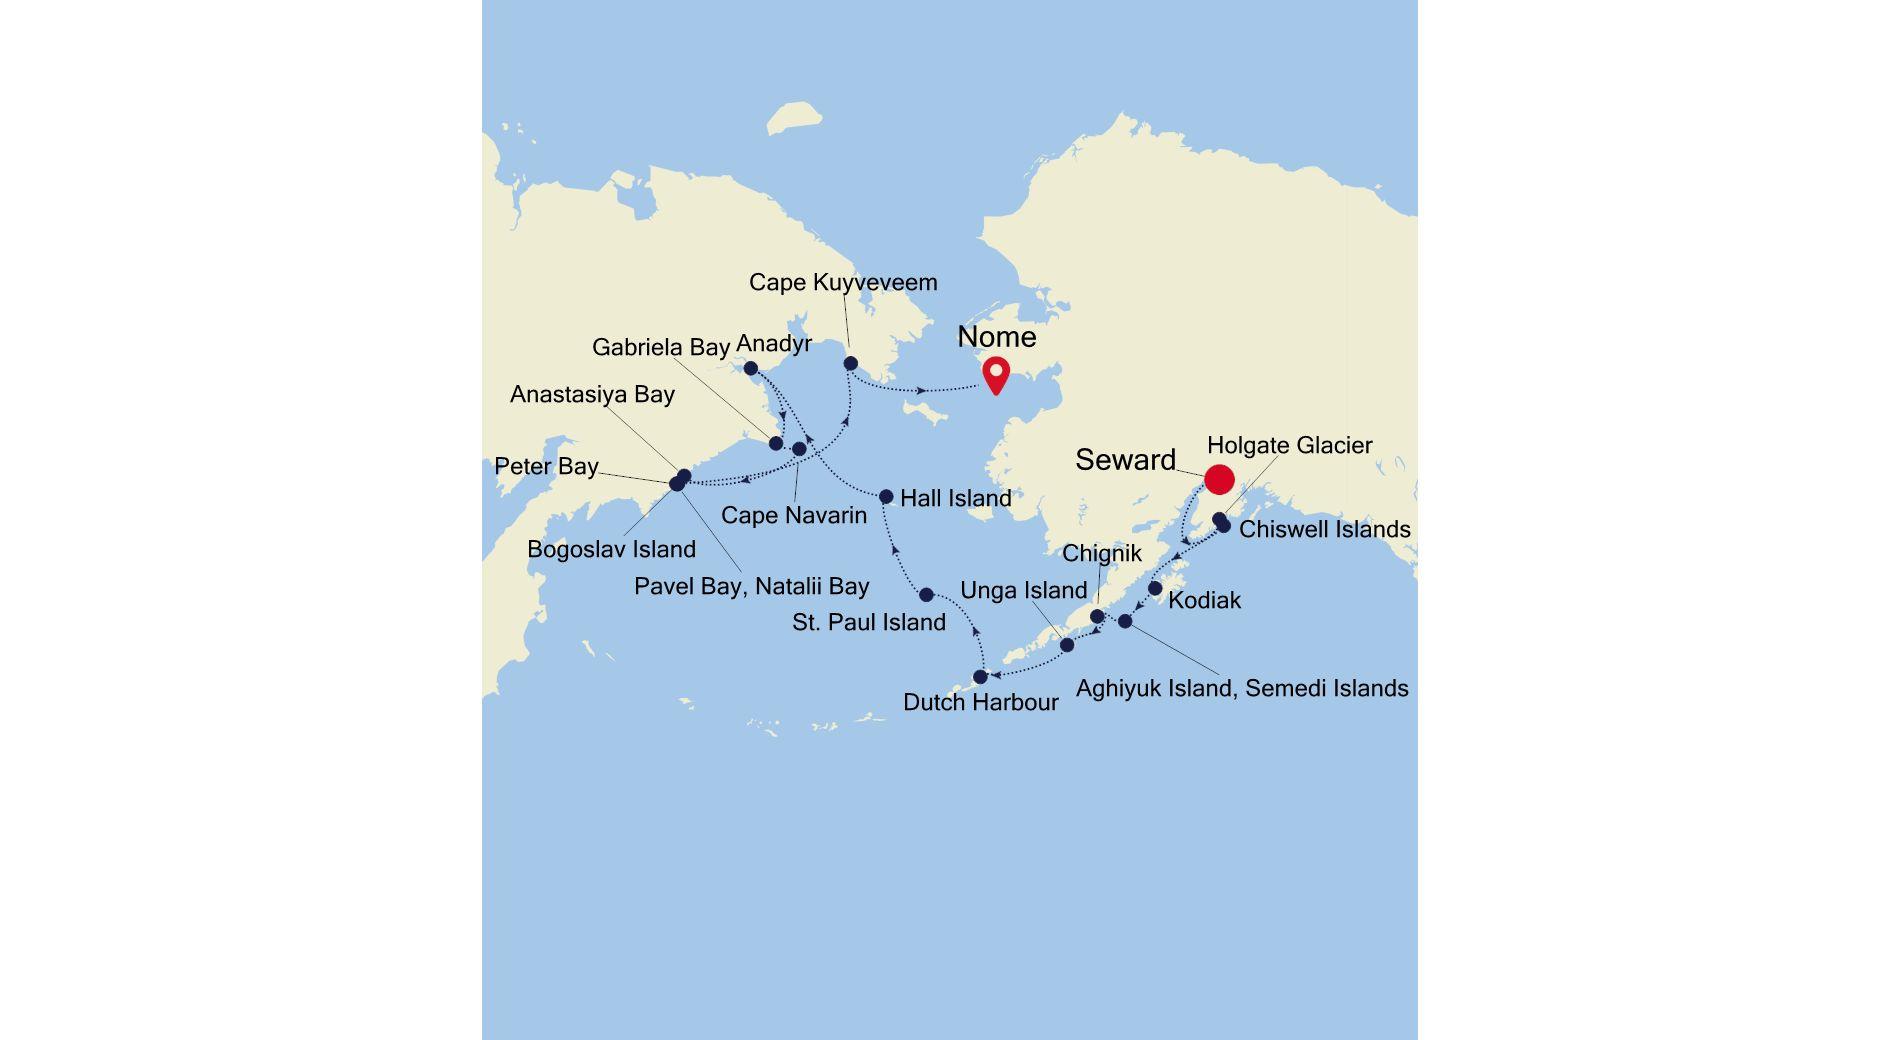 7915 - Seward to Nome